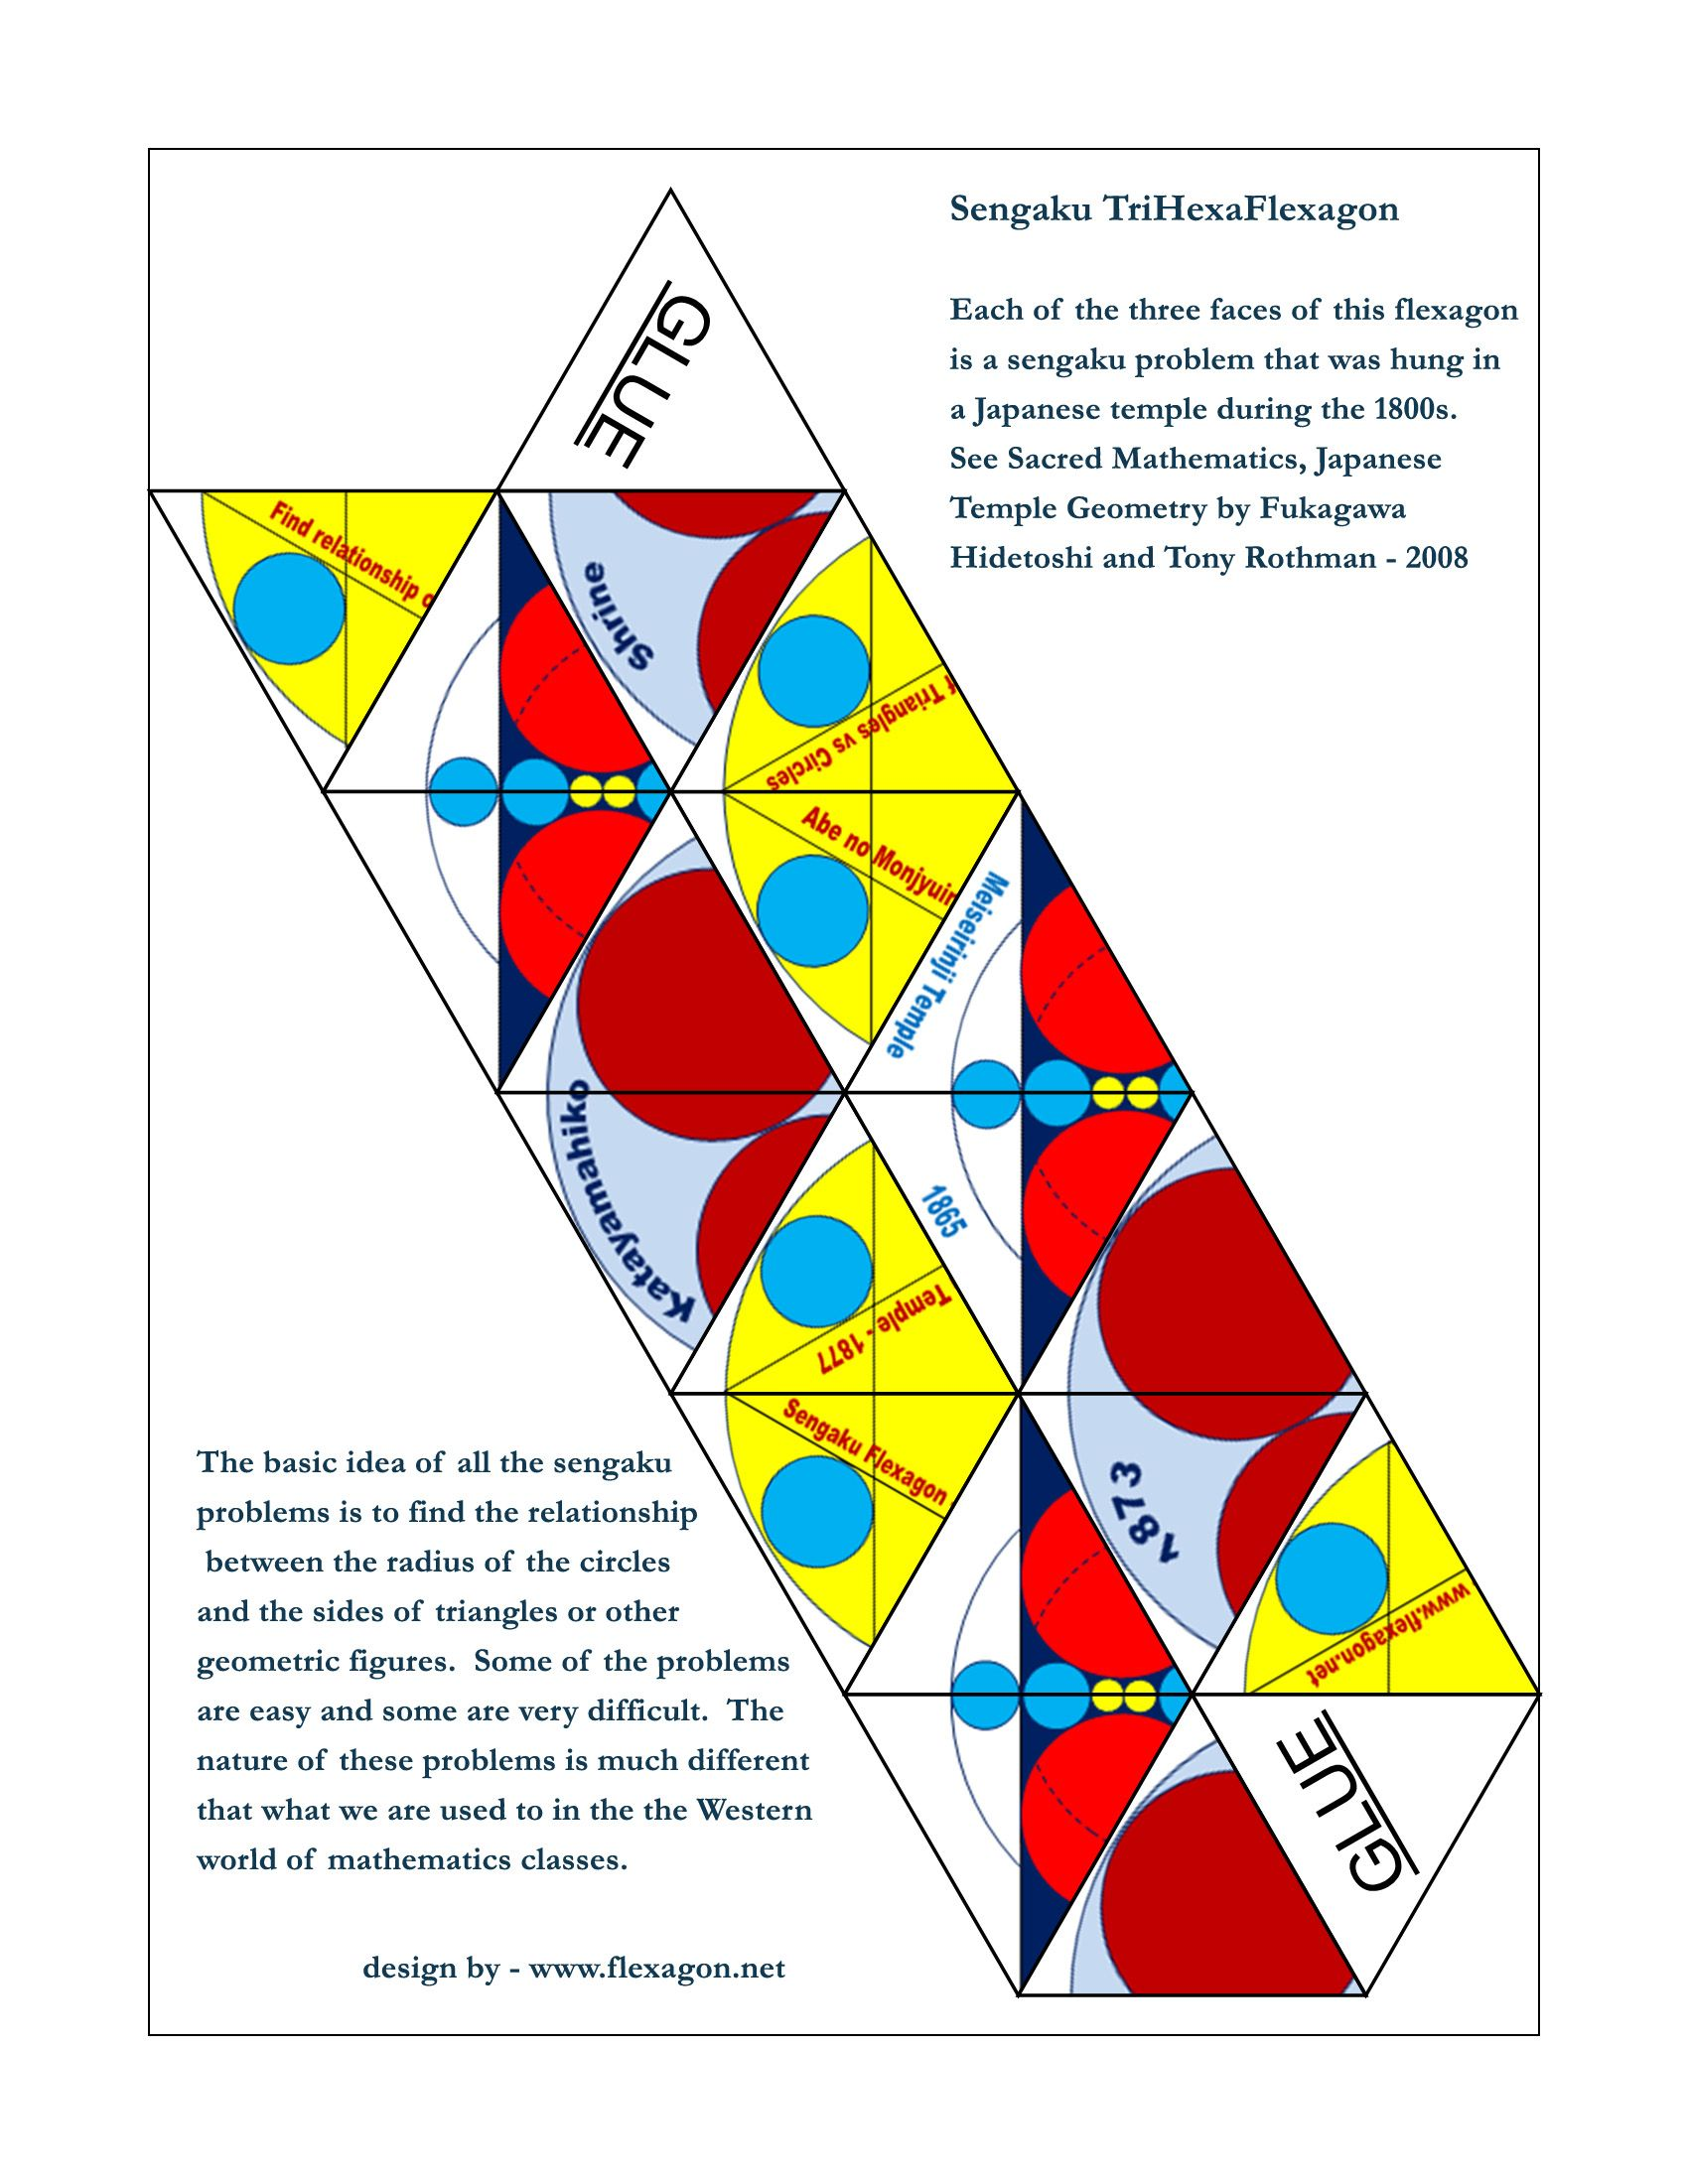 Pin by hollymath on Flexagons | Origami, Origami, kirigami ... - photo#43